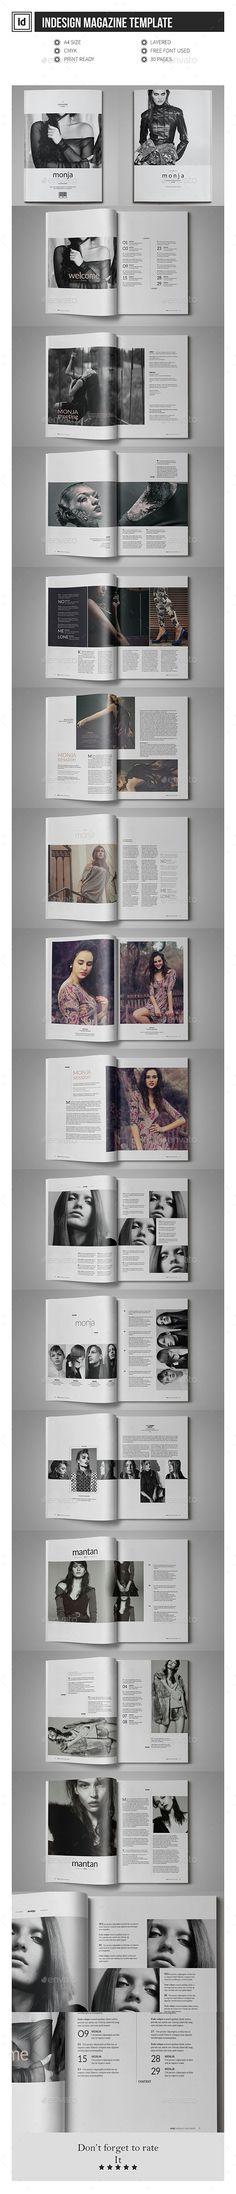 Multipurpose InDesign Magazine Template #design Download: http://graphicriver.net/item/multipurpose-indesign-magazine-template/12046872?ref=ksioks